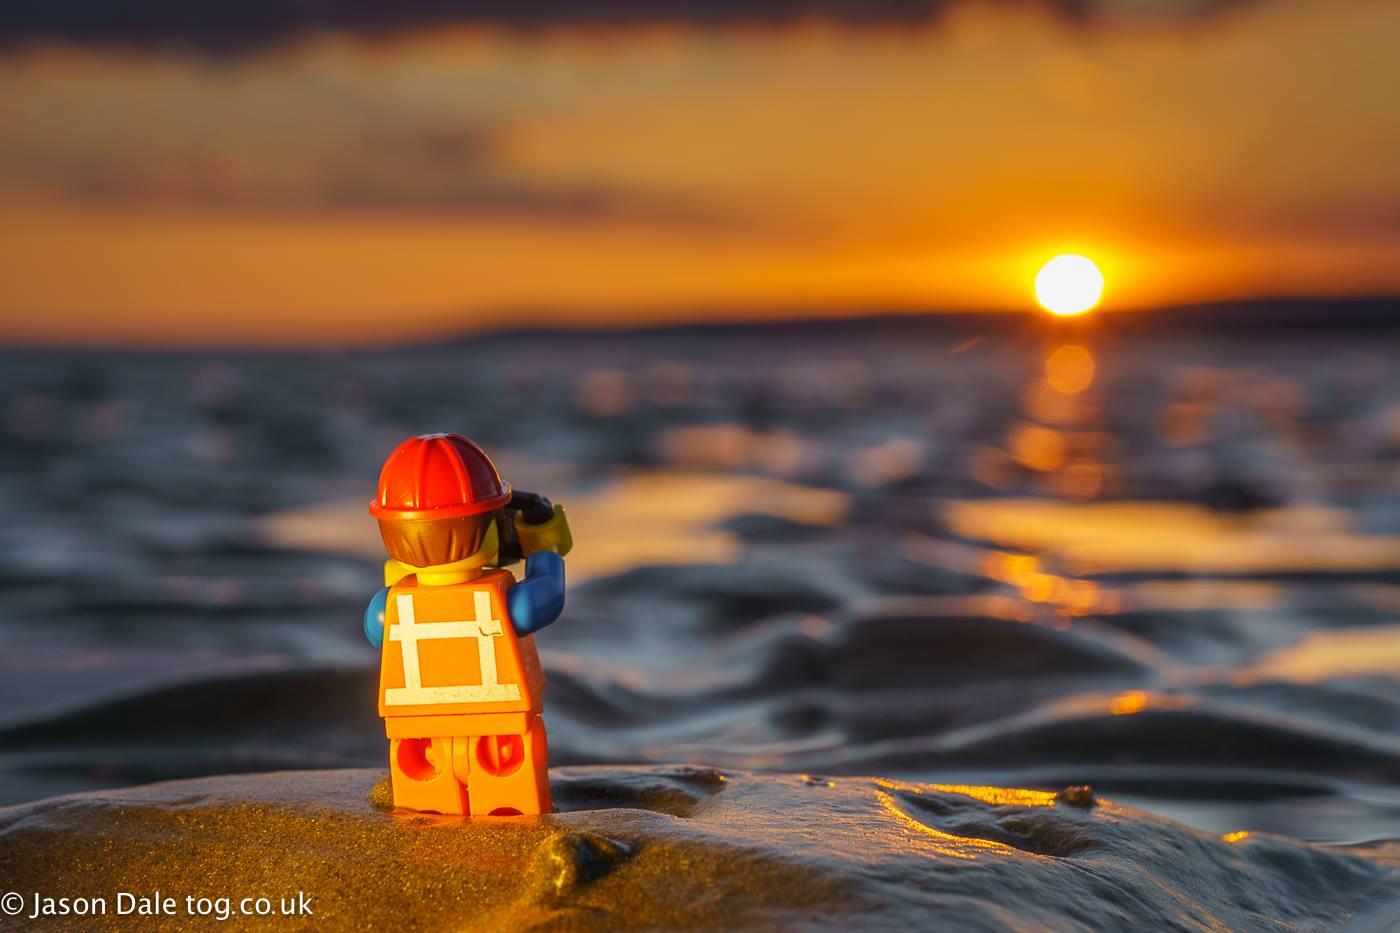 Cute Lego Stormtrooper Wallpaper Lego Photography Jason Dale Photography